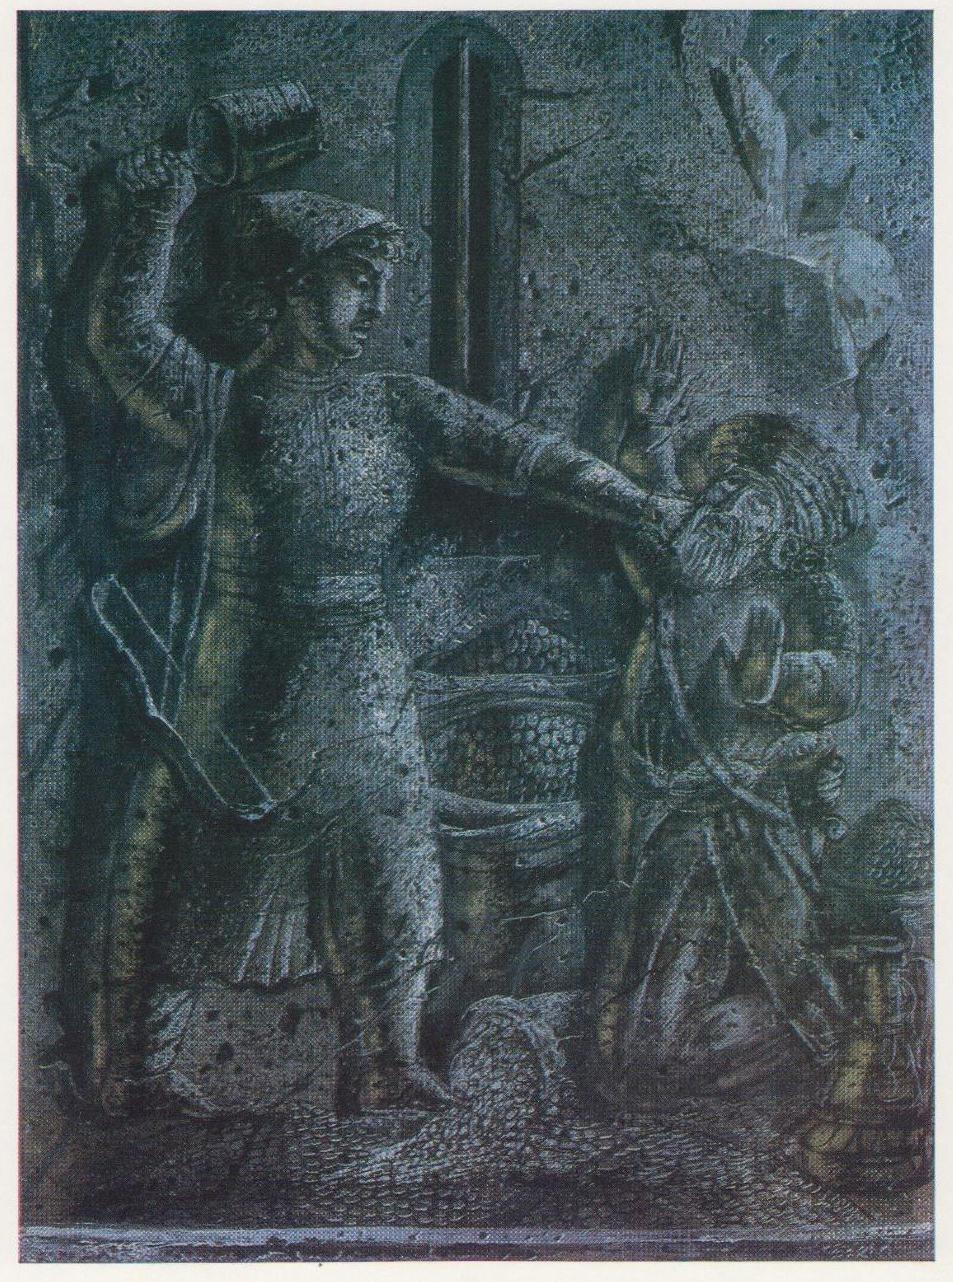 Е.С. Кочар Давид и сборщики дани. Иллюстрация к эпосу «Давид Сасунский». 1939